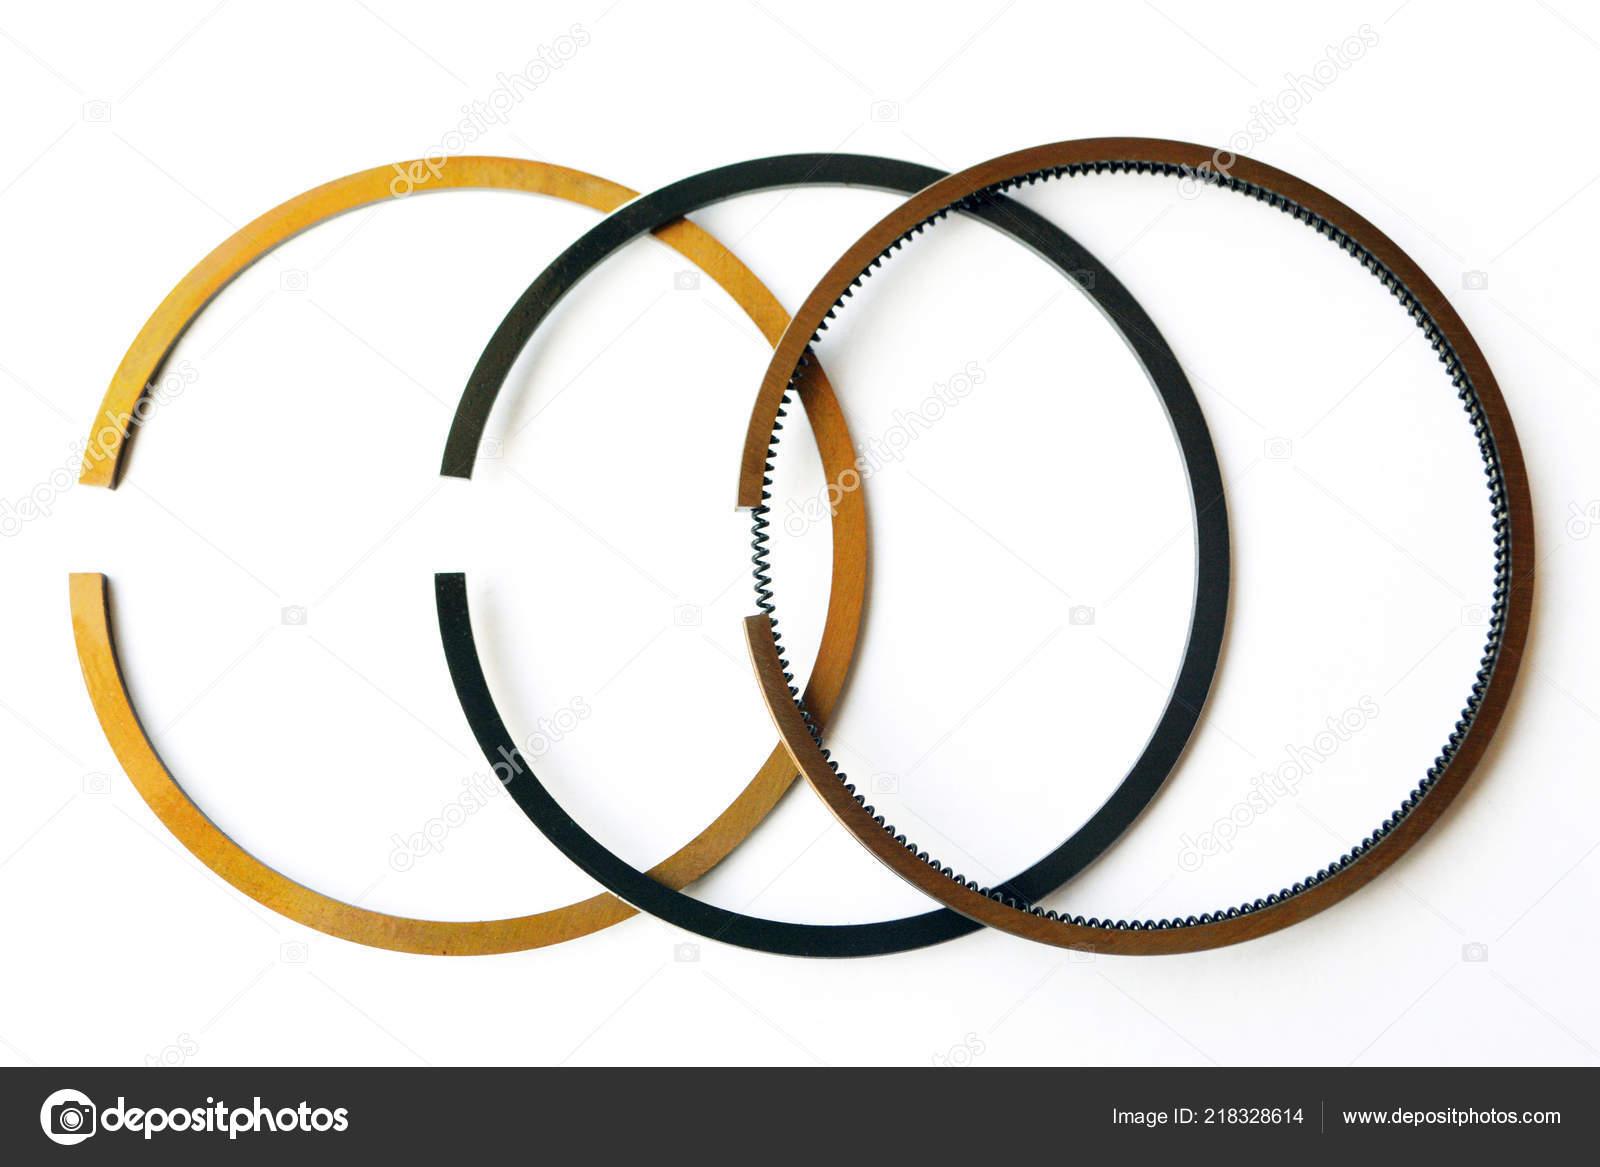 new car piston rings on — Stock Photo © notsuperstar gmail